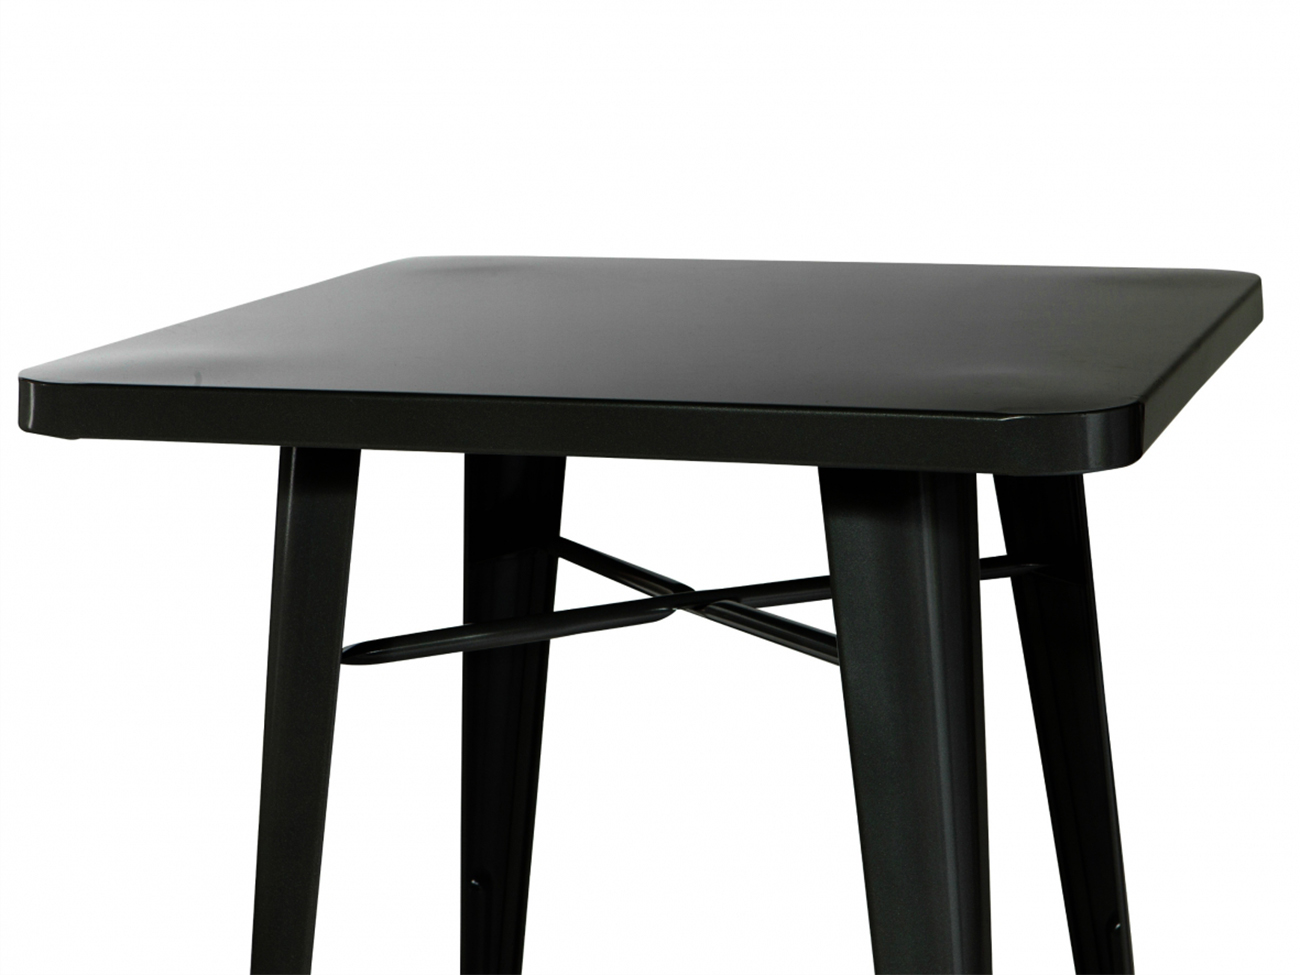 bord lyon svart reforma sthlm. Black Bedroom Furniture Sets. Home Design Ideas